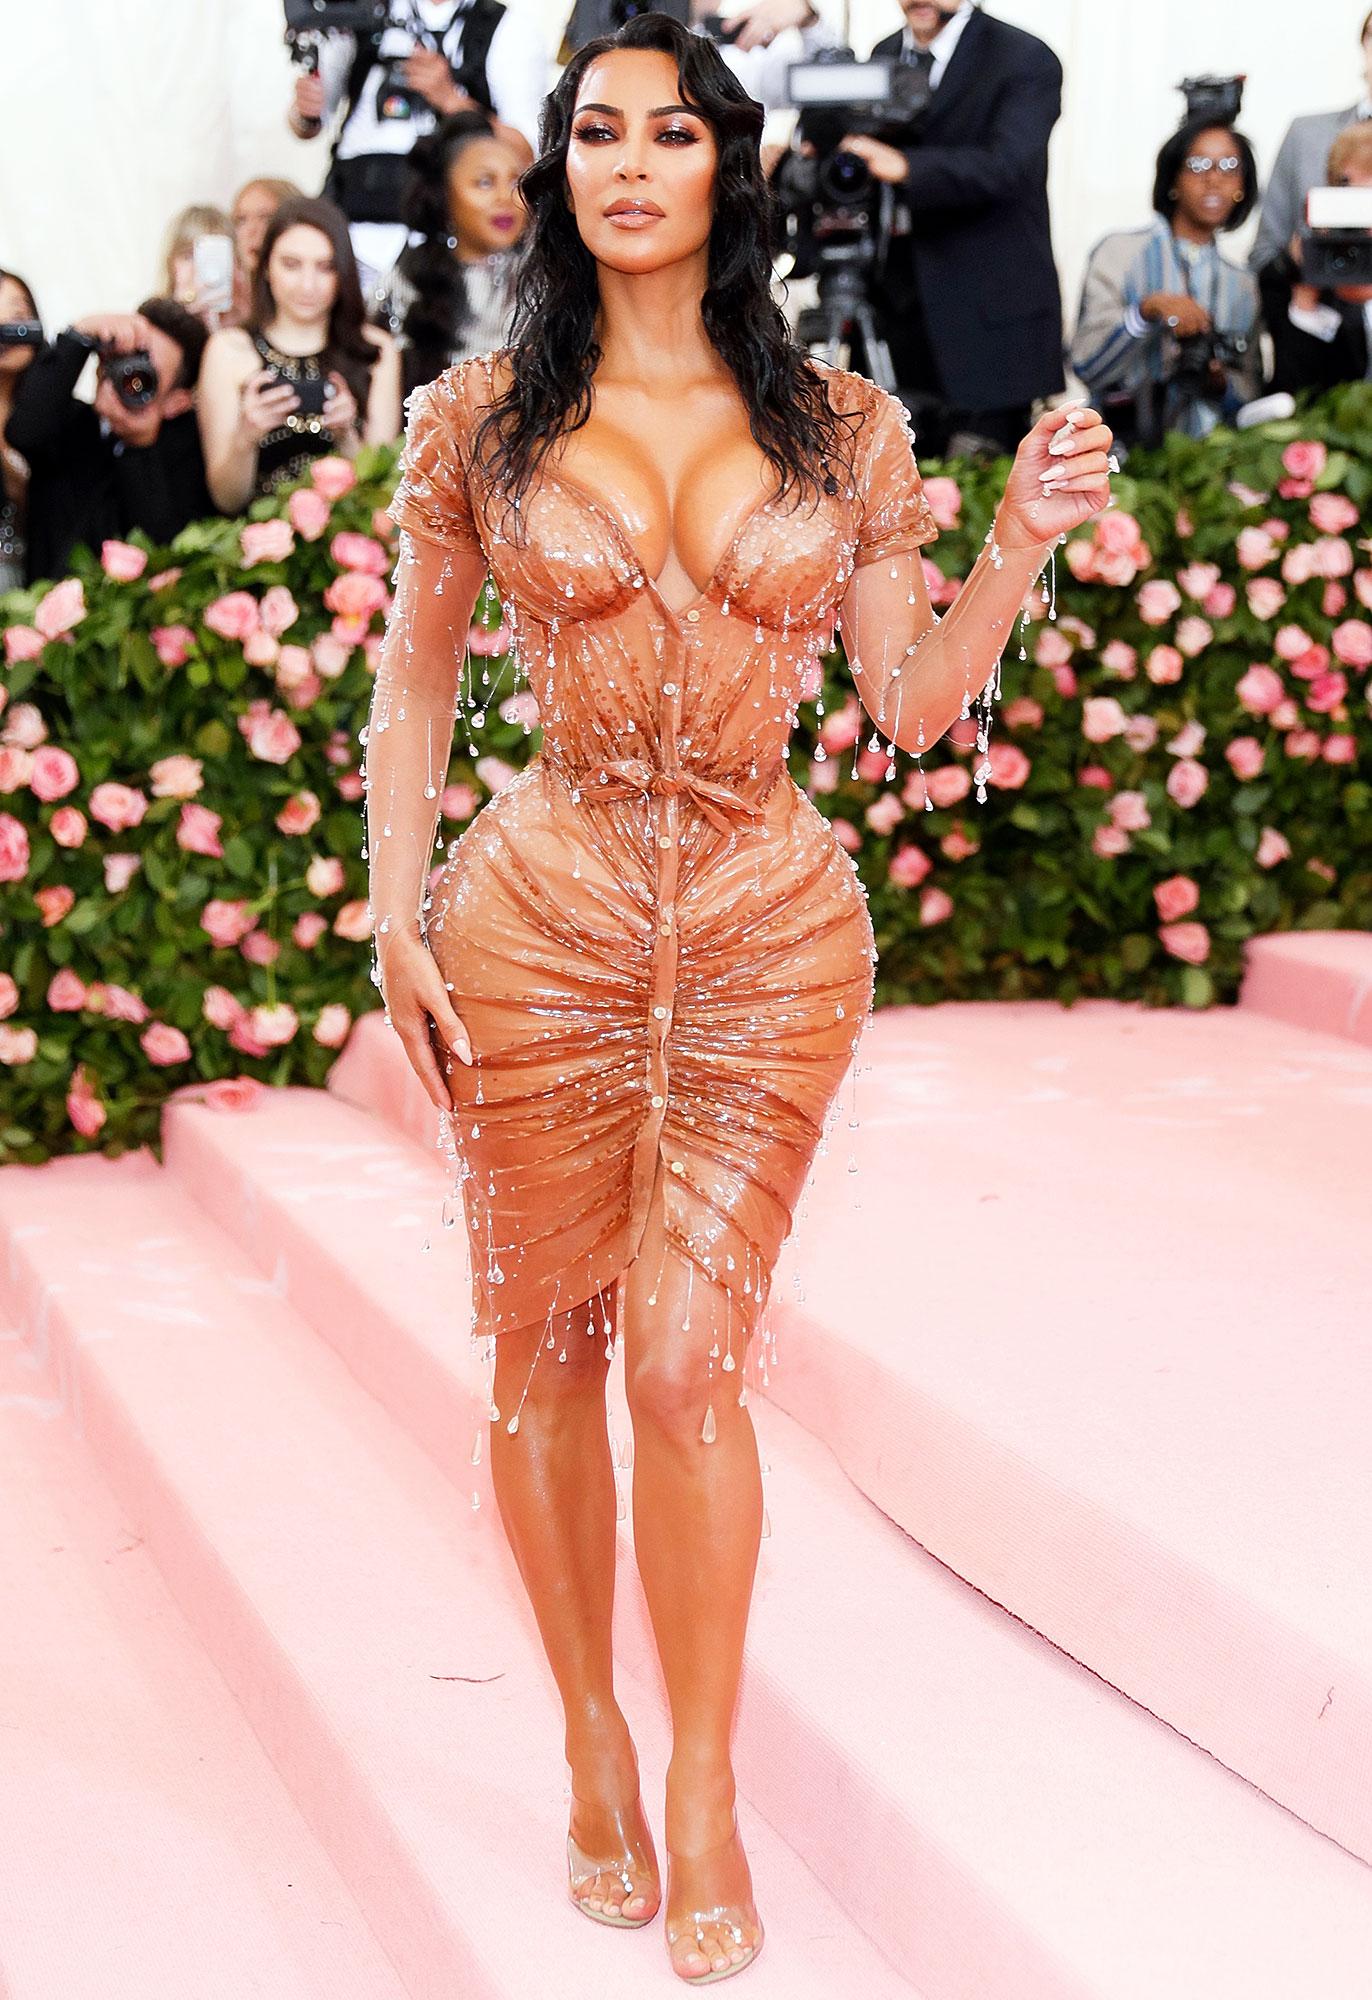 Kourtney Kardashian Slams Kim Kardashian Met Gala Look on KUWTK